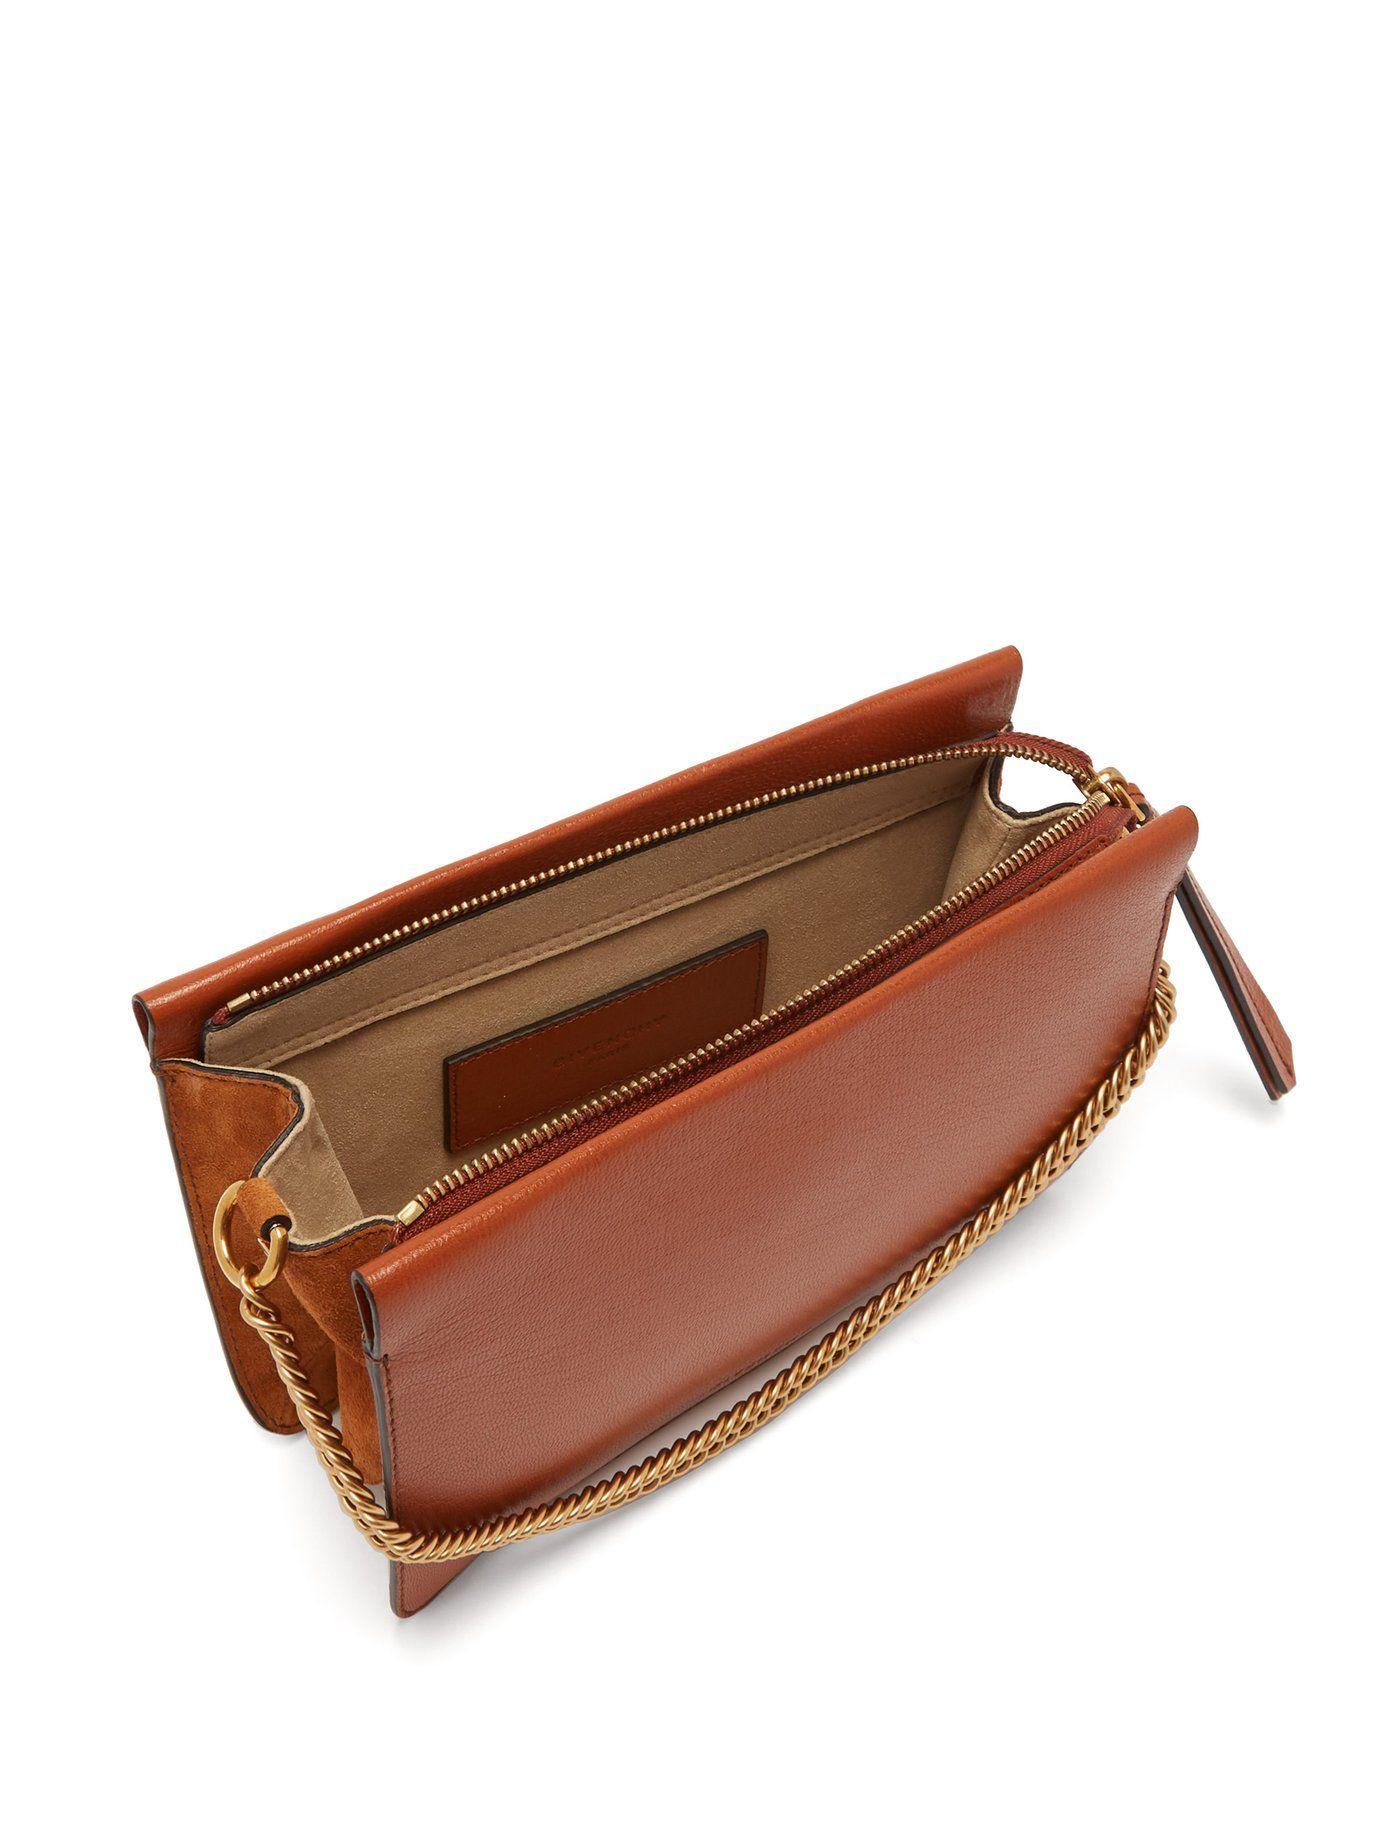 89688c0fdd Cross3 leather cross-body bag